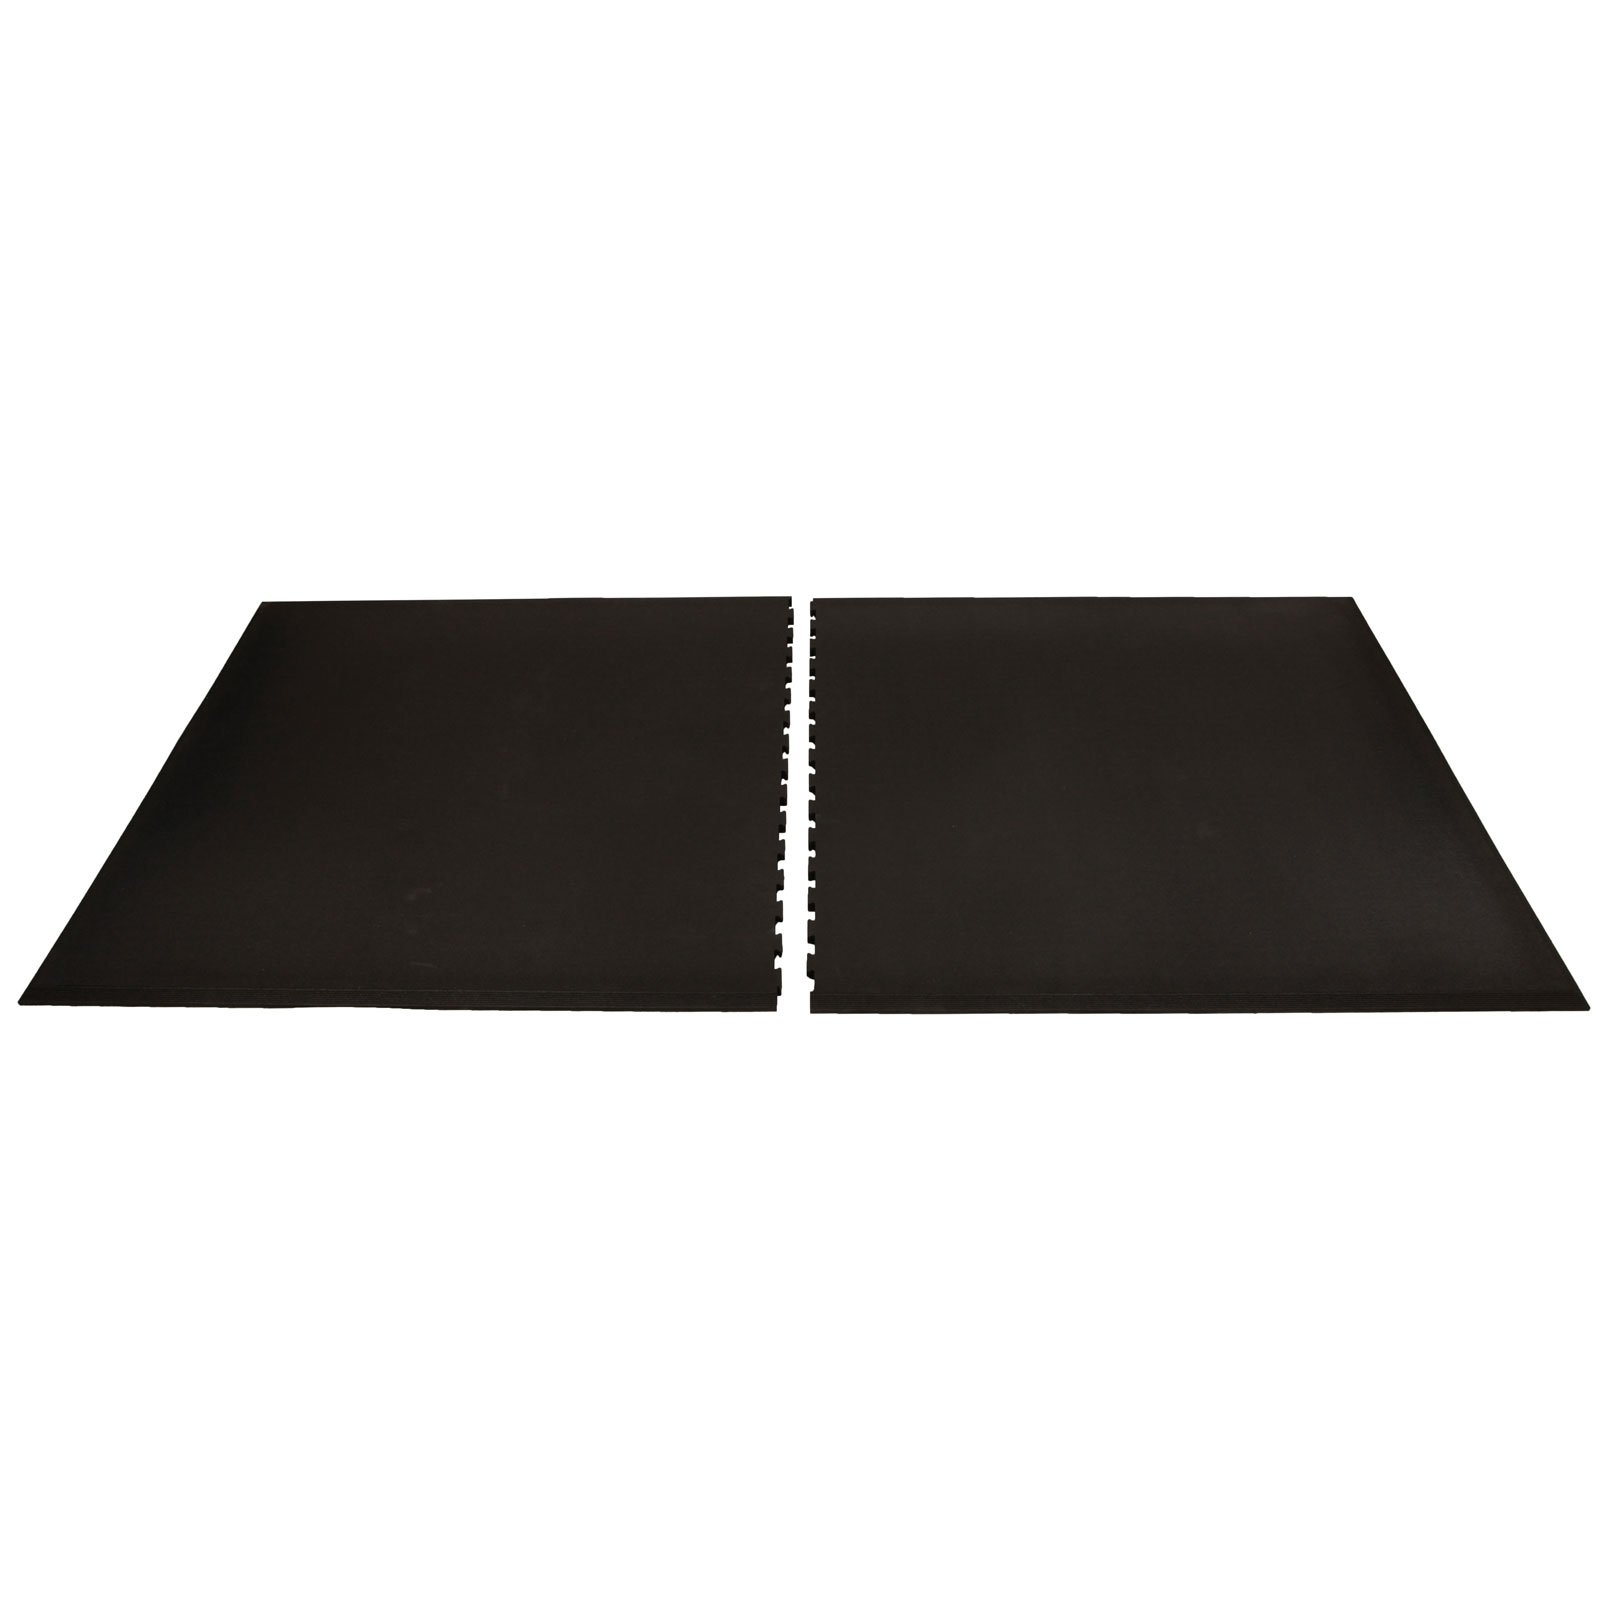 IncStores 3/4in Shock Mats Interlocking Heavy Duty High Impact Weight Room Gym Flooring